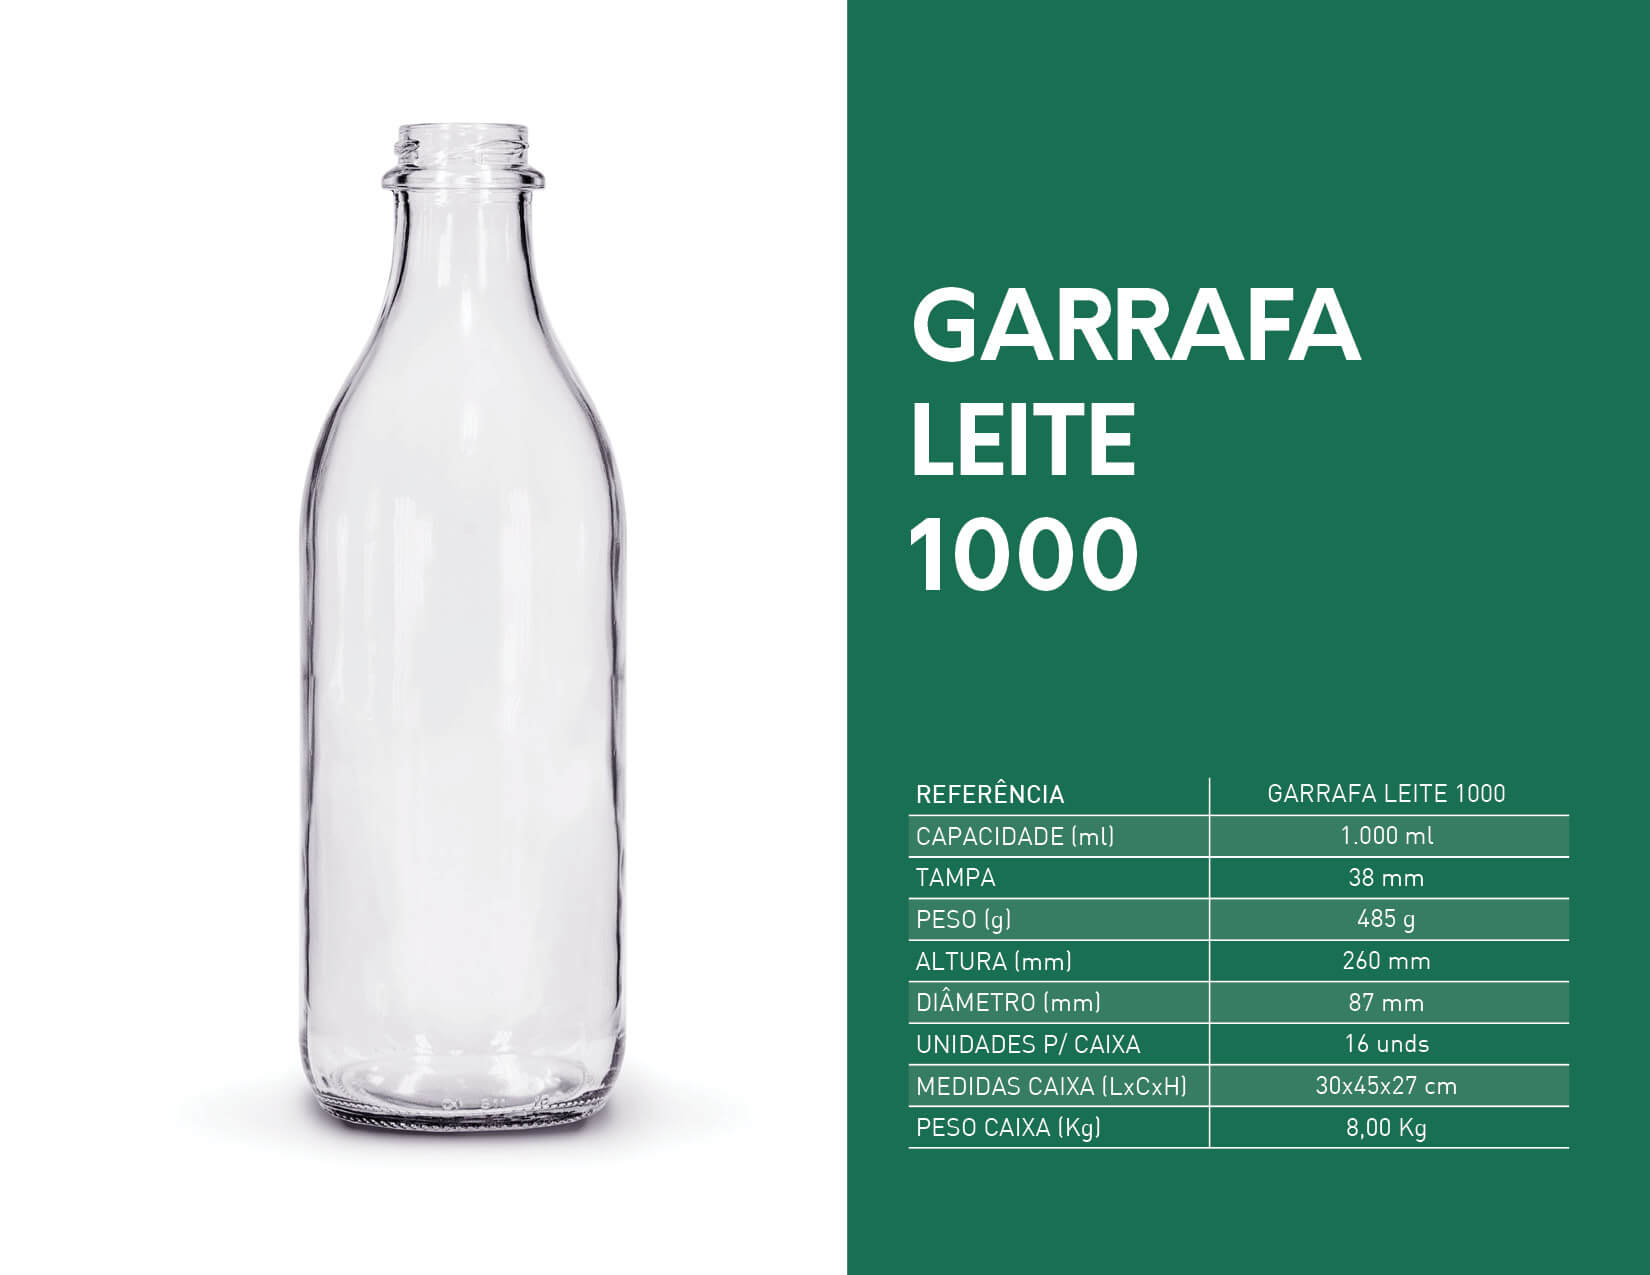 042-Garrafa-de-leite-1000-irmaos-bellacosa-embalagens-de-vidro